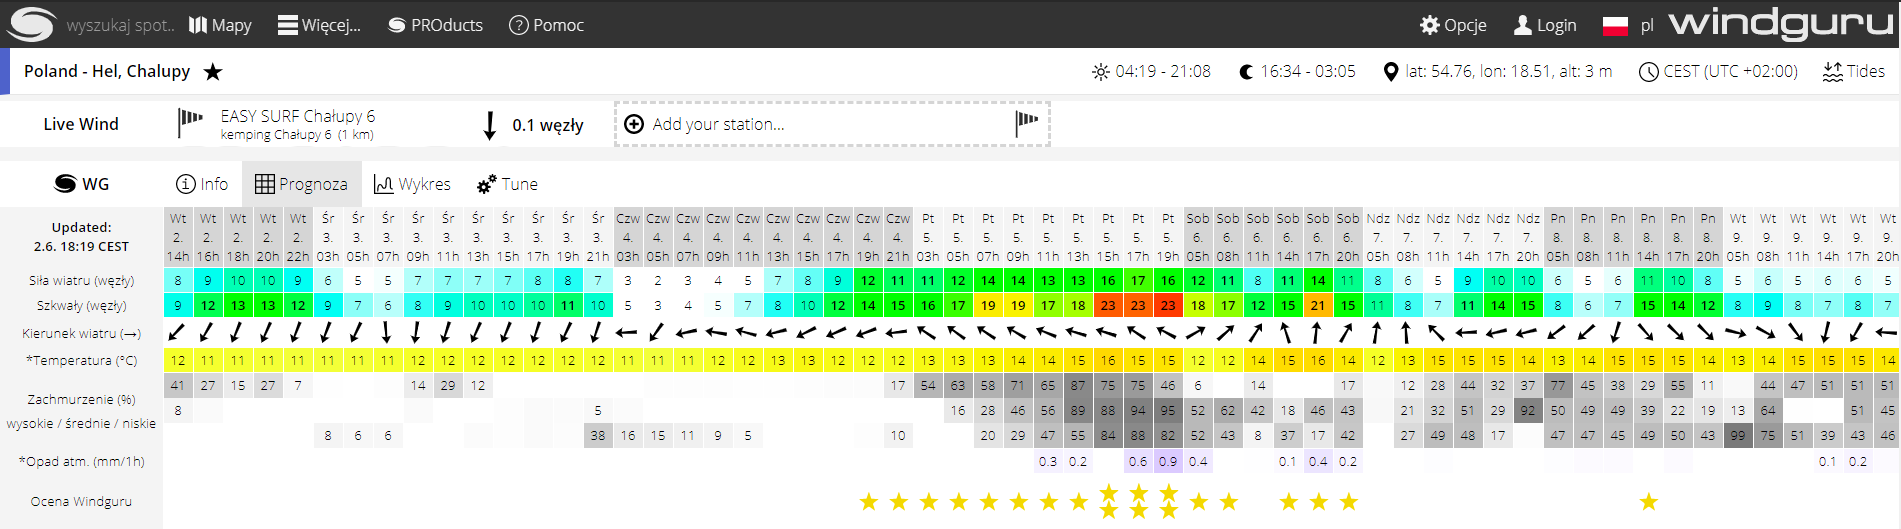 prognoza pogody windguru